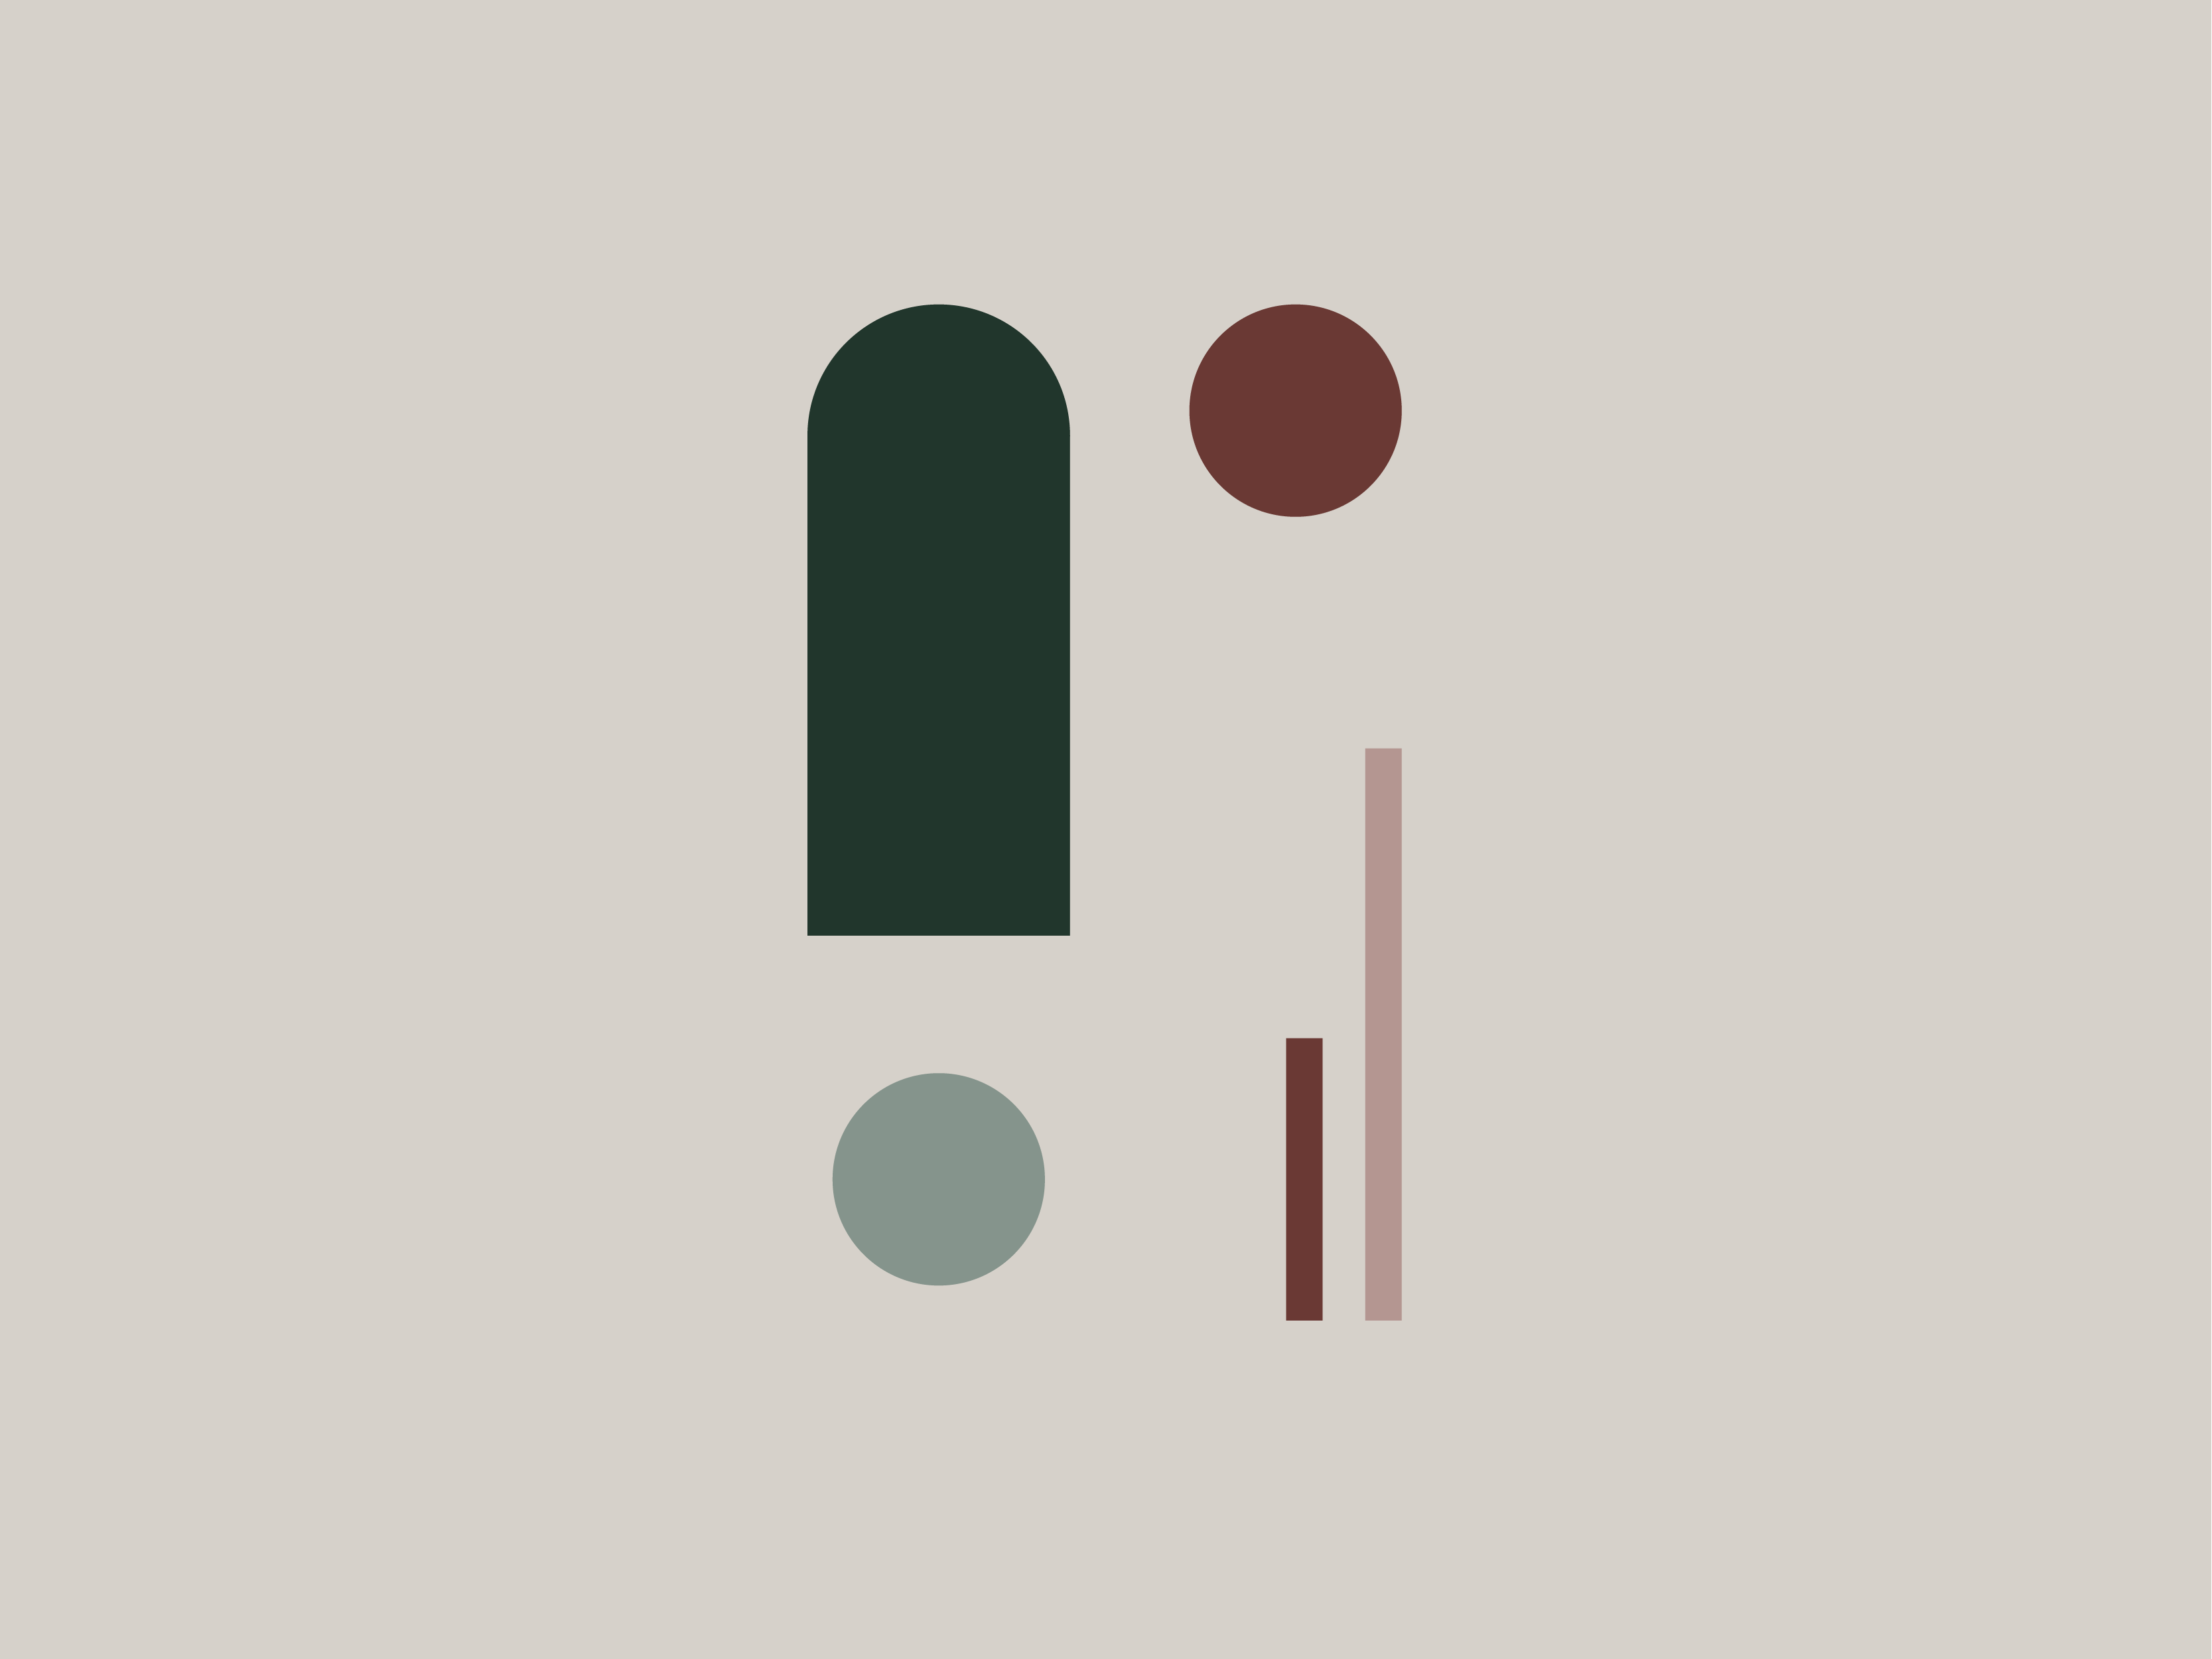 Untitled 1 04 01